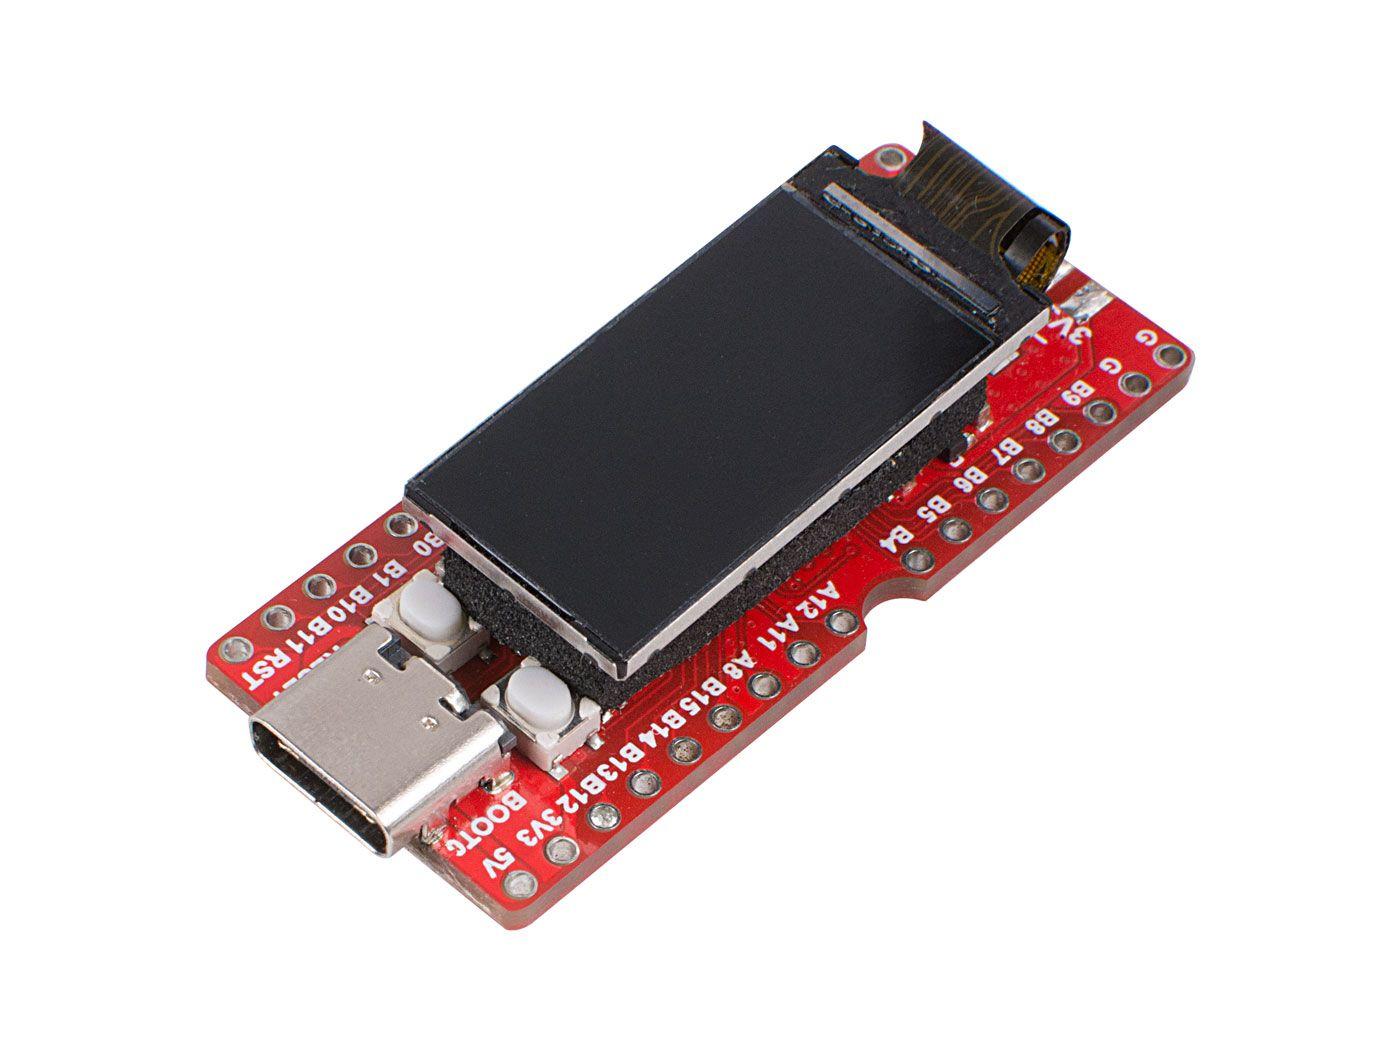 Sipeed Longan Nano – RISC-V GD32VF103CBT6 Development Board